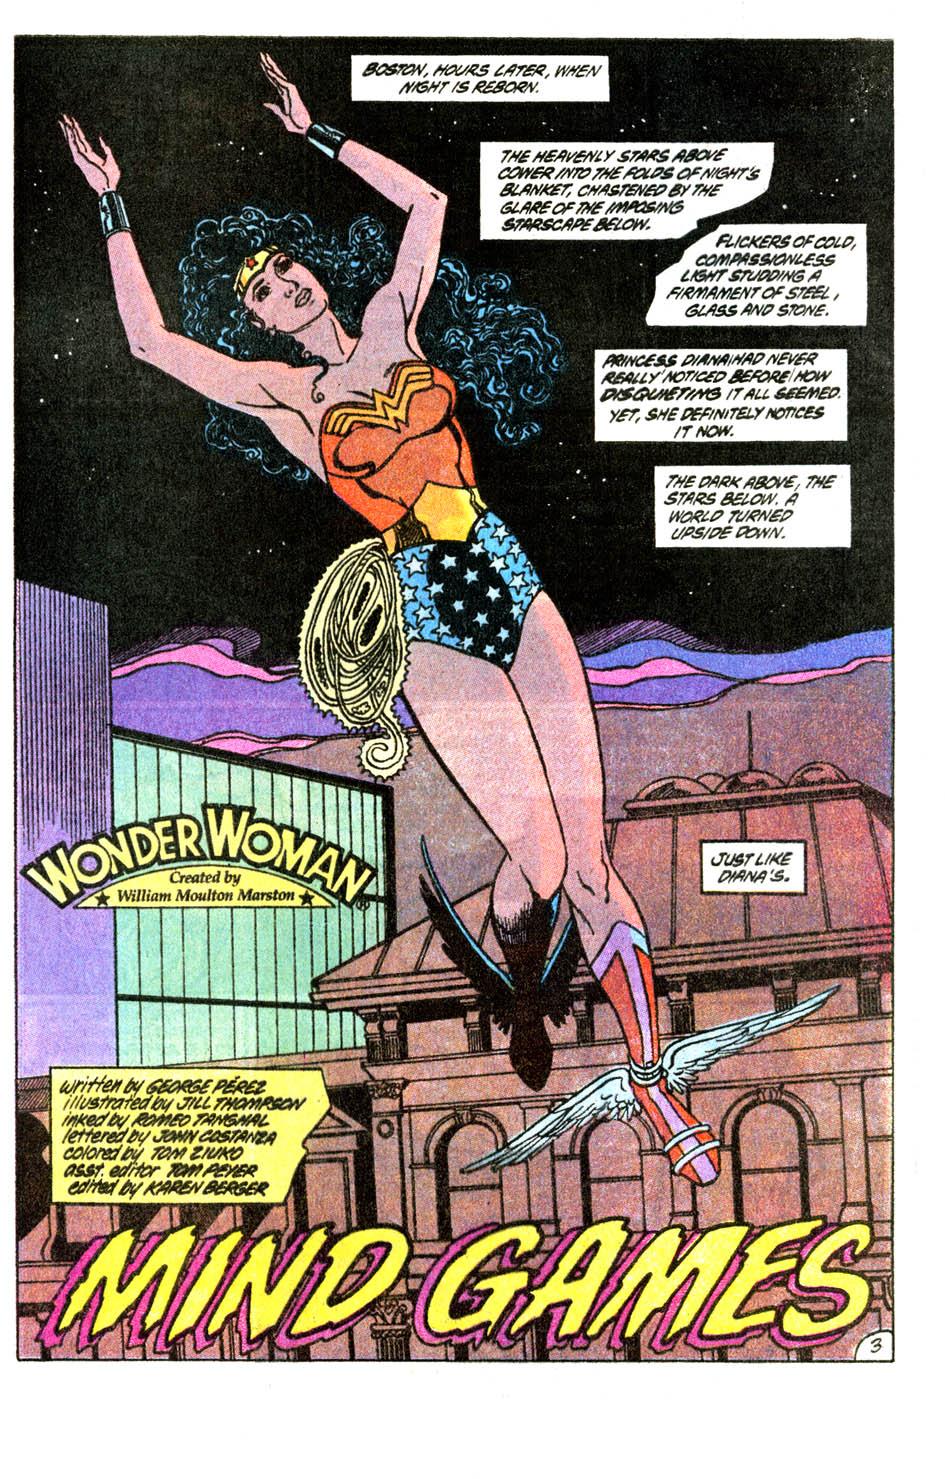 Read online Wonder Woman (1987) comic -  Issue #54 - 4